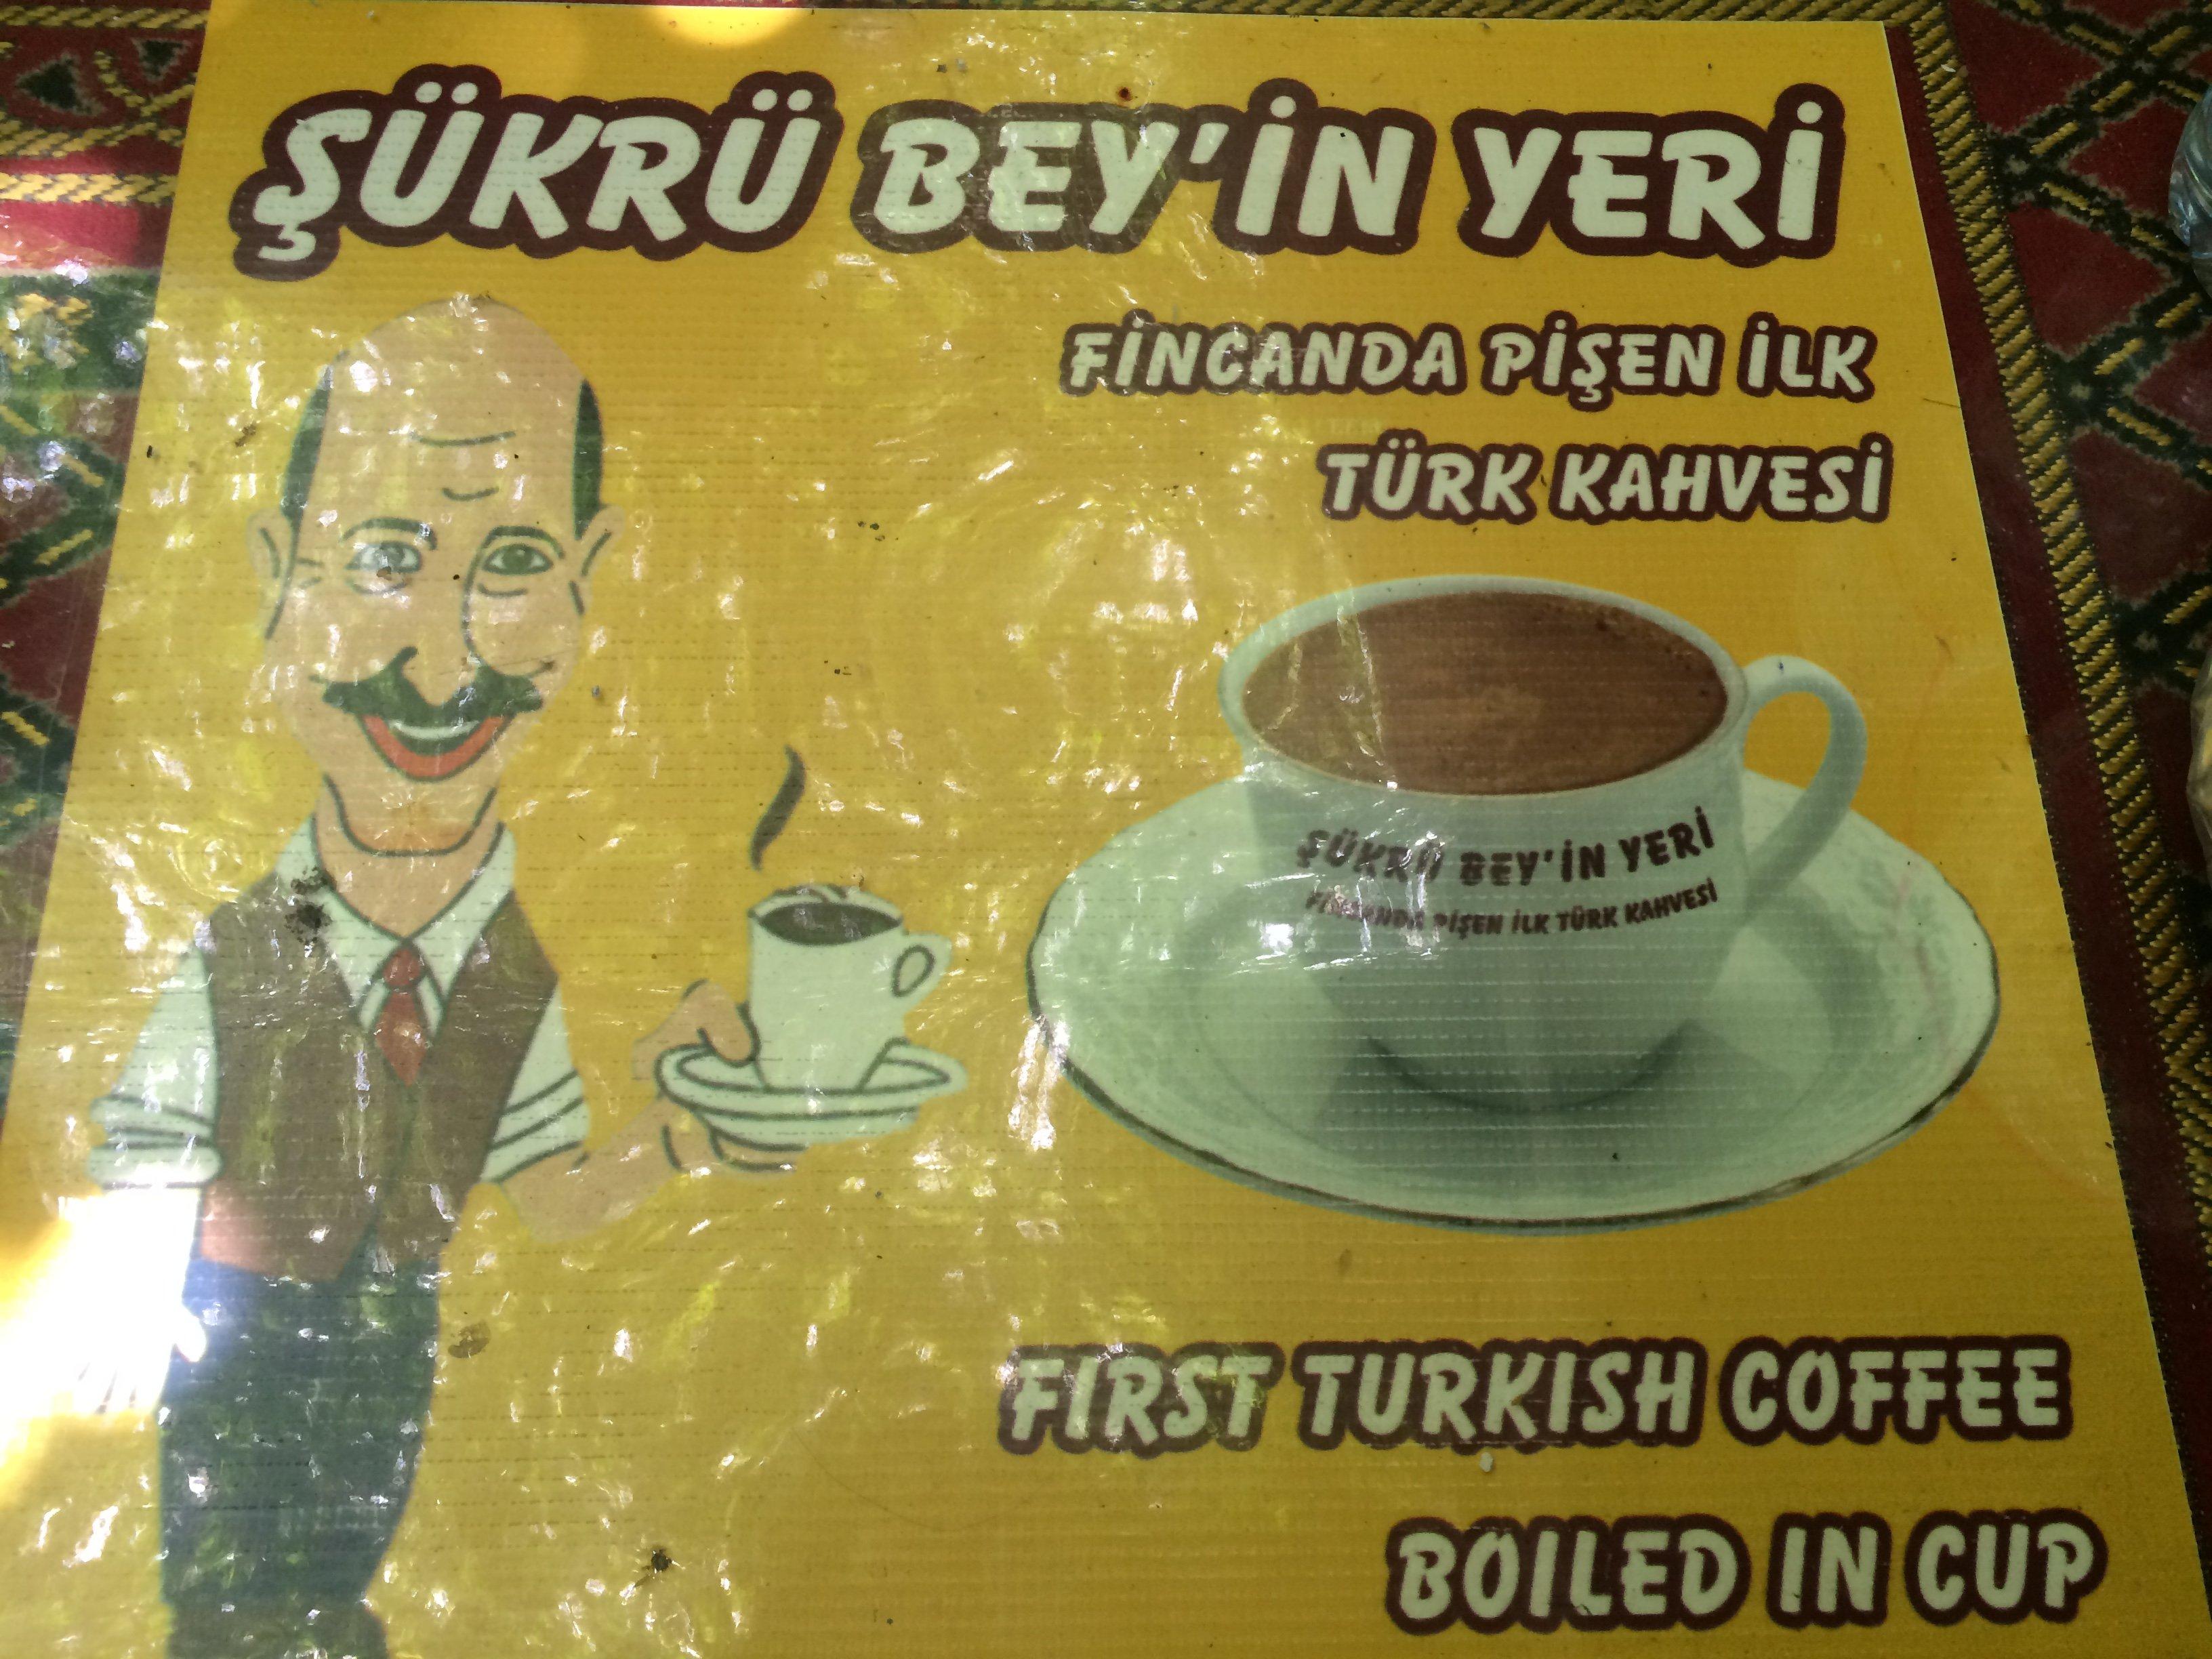 Sukru-beyin-yeri-fincanda-pisen-turk-kahvesi-2